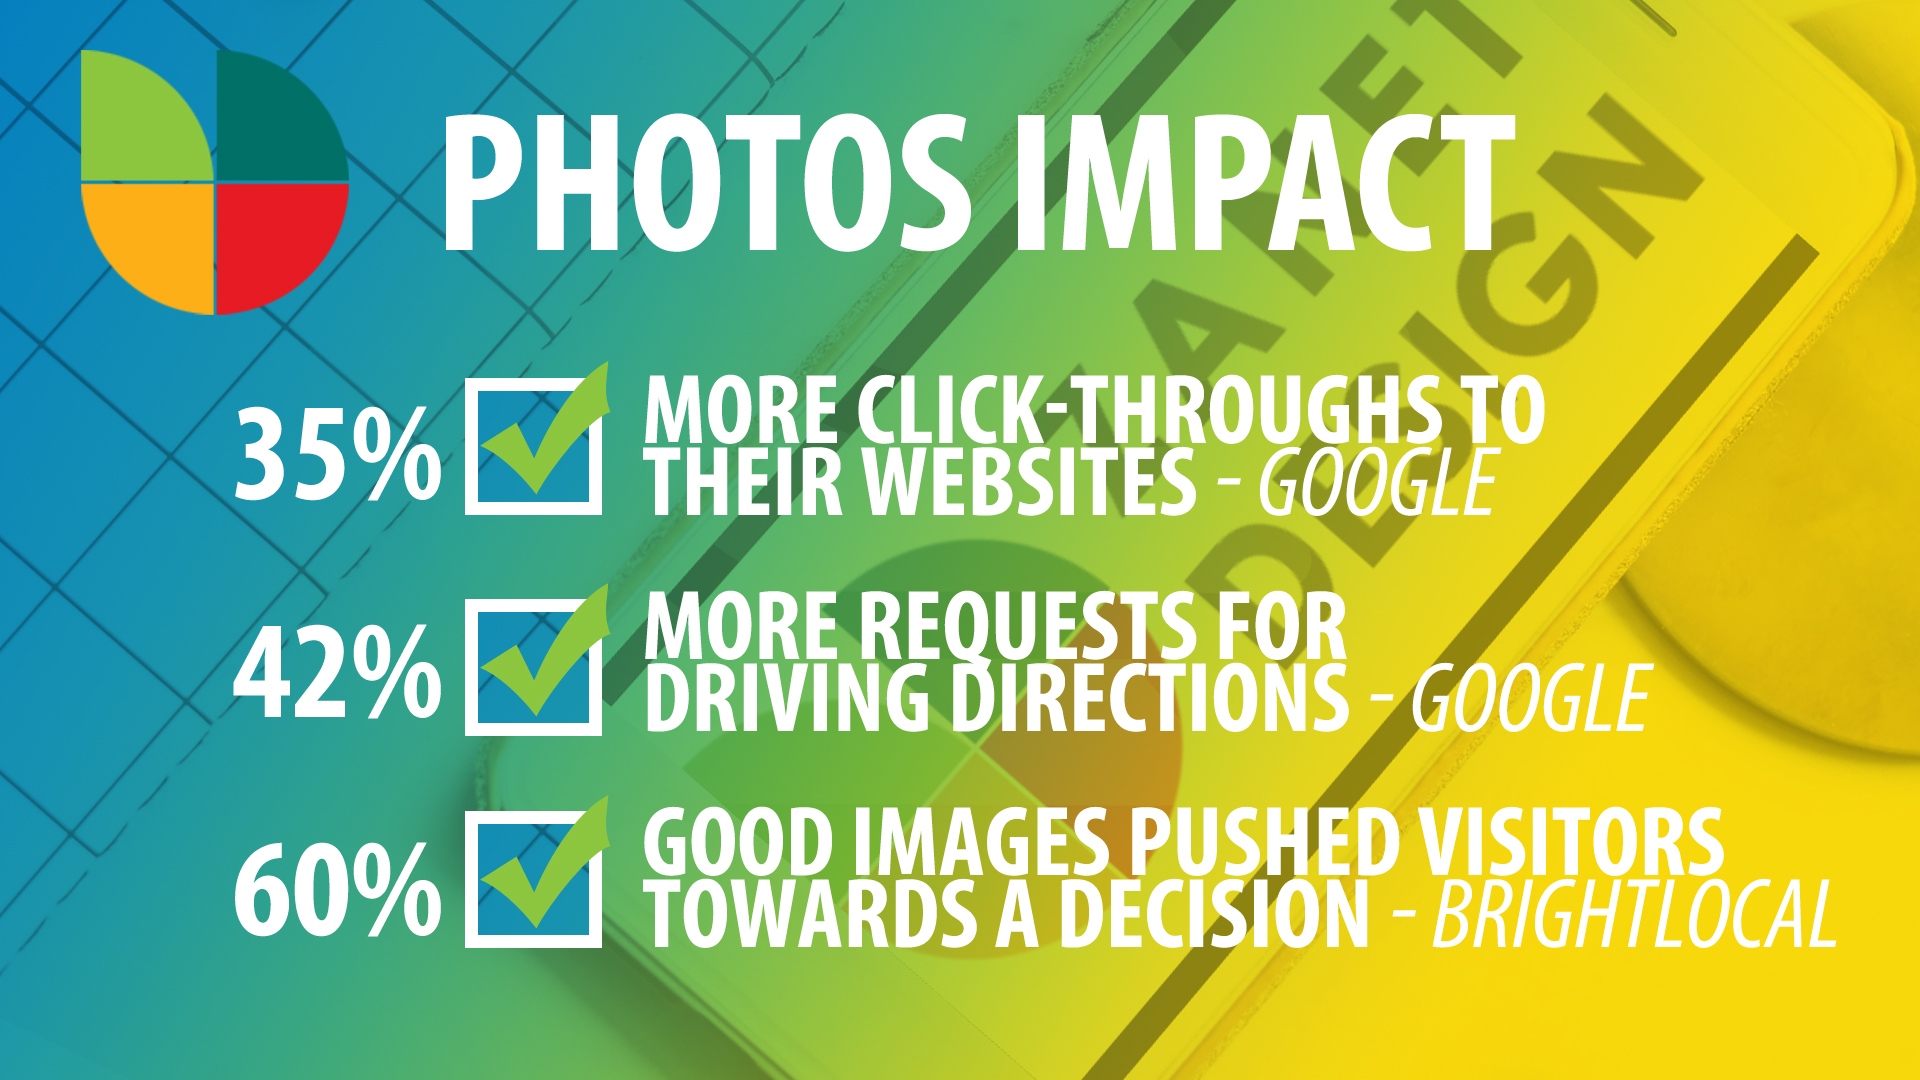 Photos impact